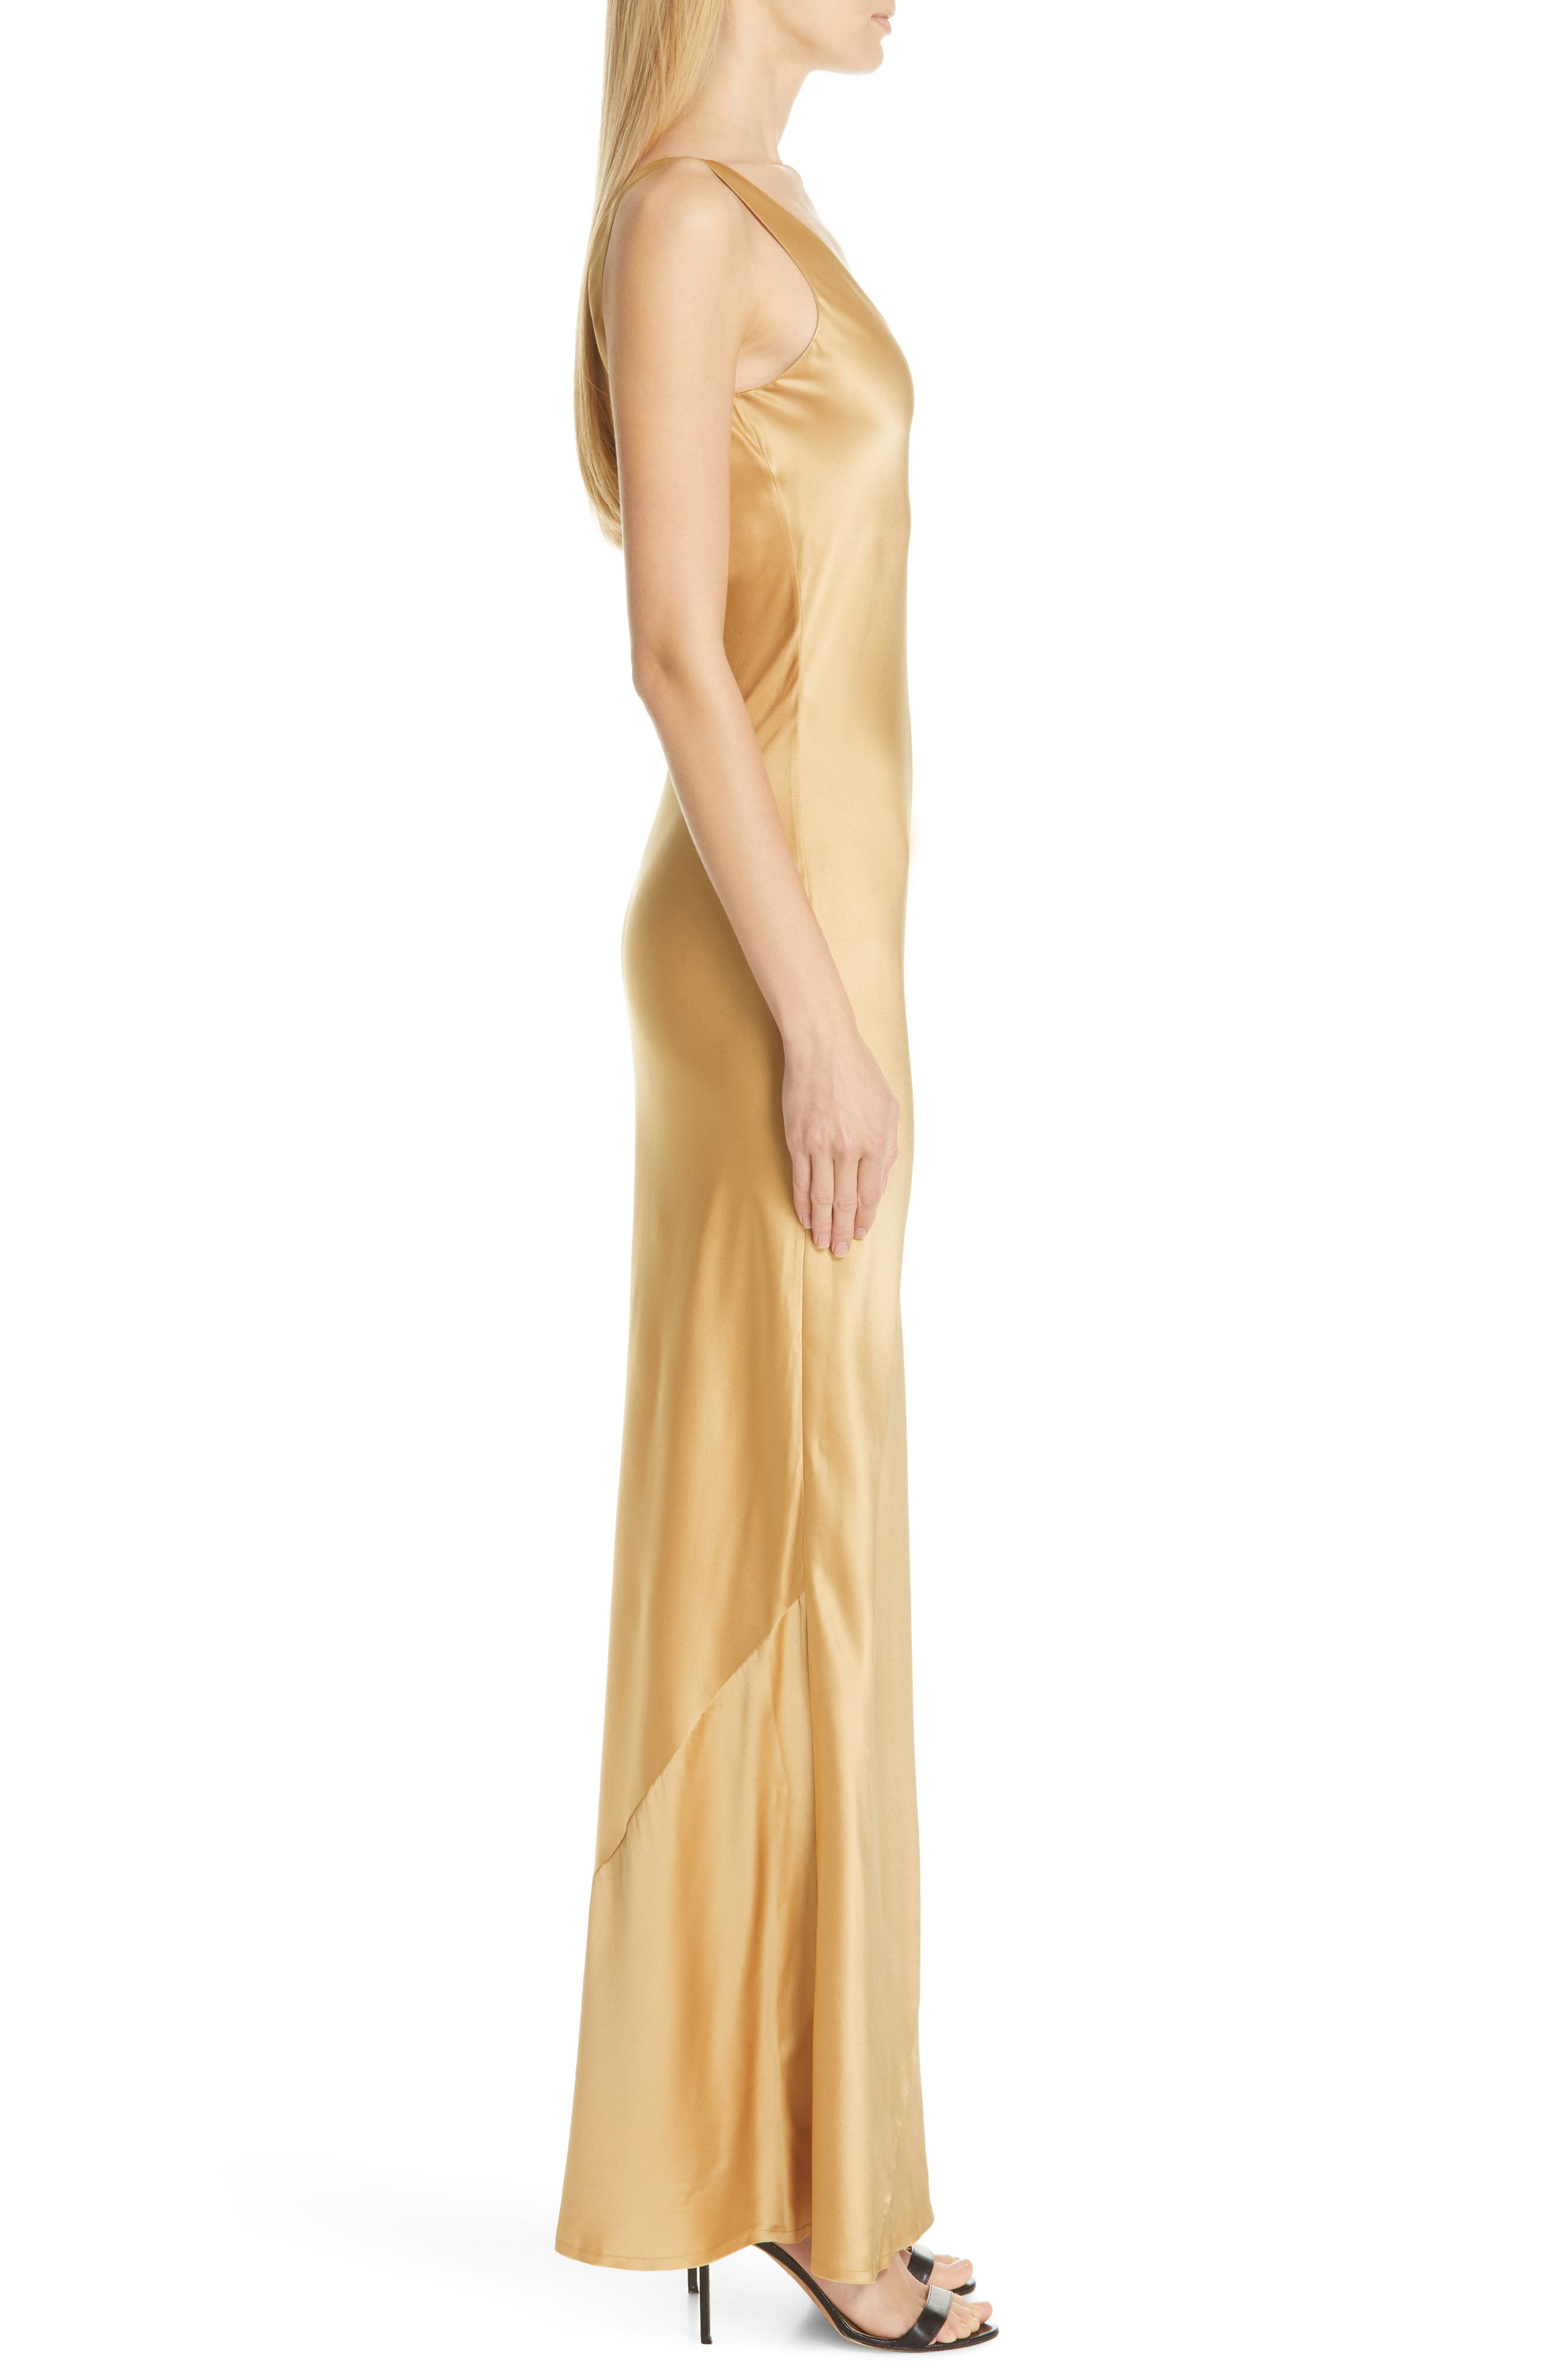 NILI LOTAN, Bazile Silk Evening Dress, Alternate thumbnail 3, color, GOLDEN